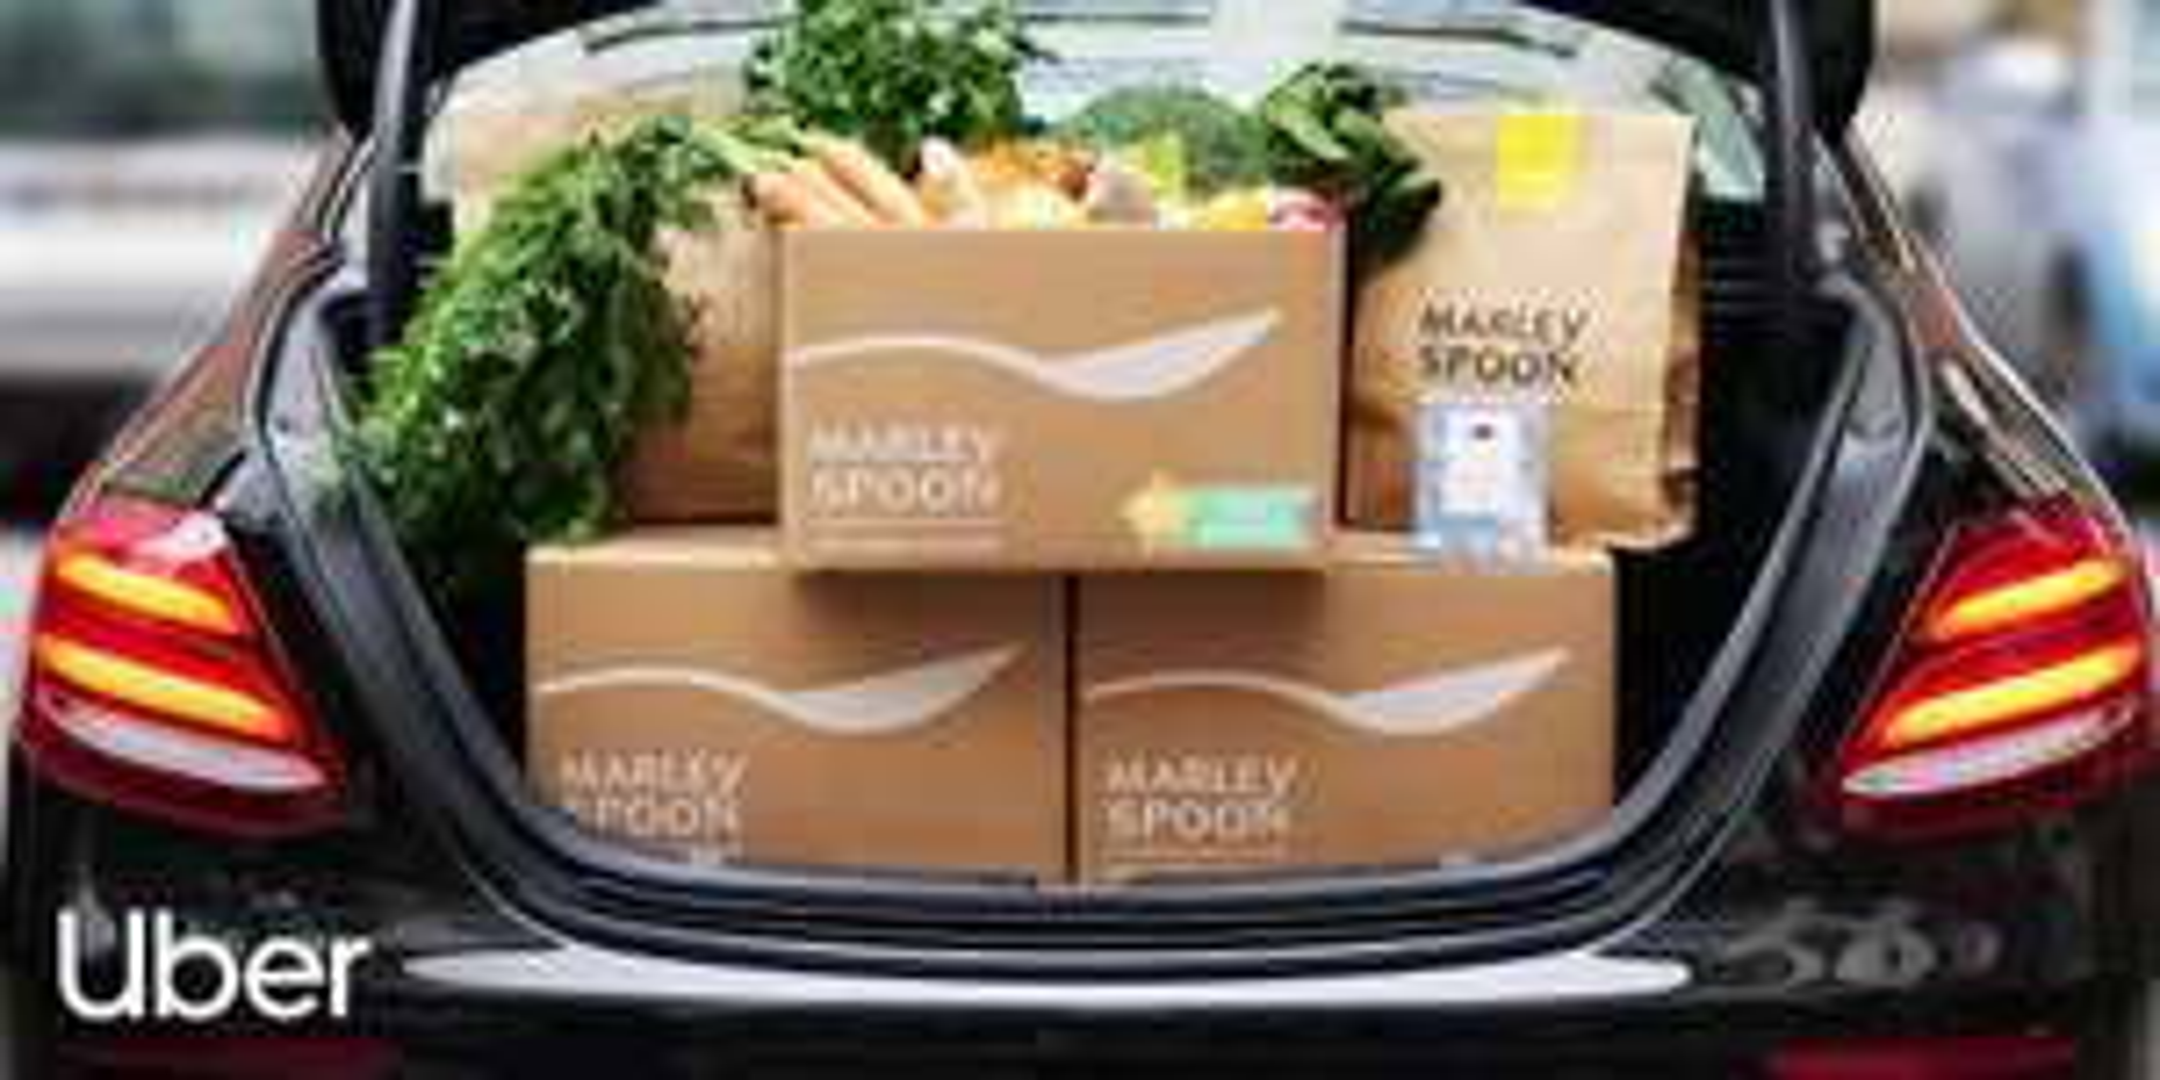 Kostenlose Marley Spoon Kochboxen über die Uber-App bestellen am 13.11. (Berlin)